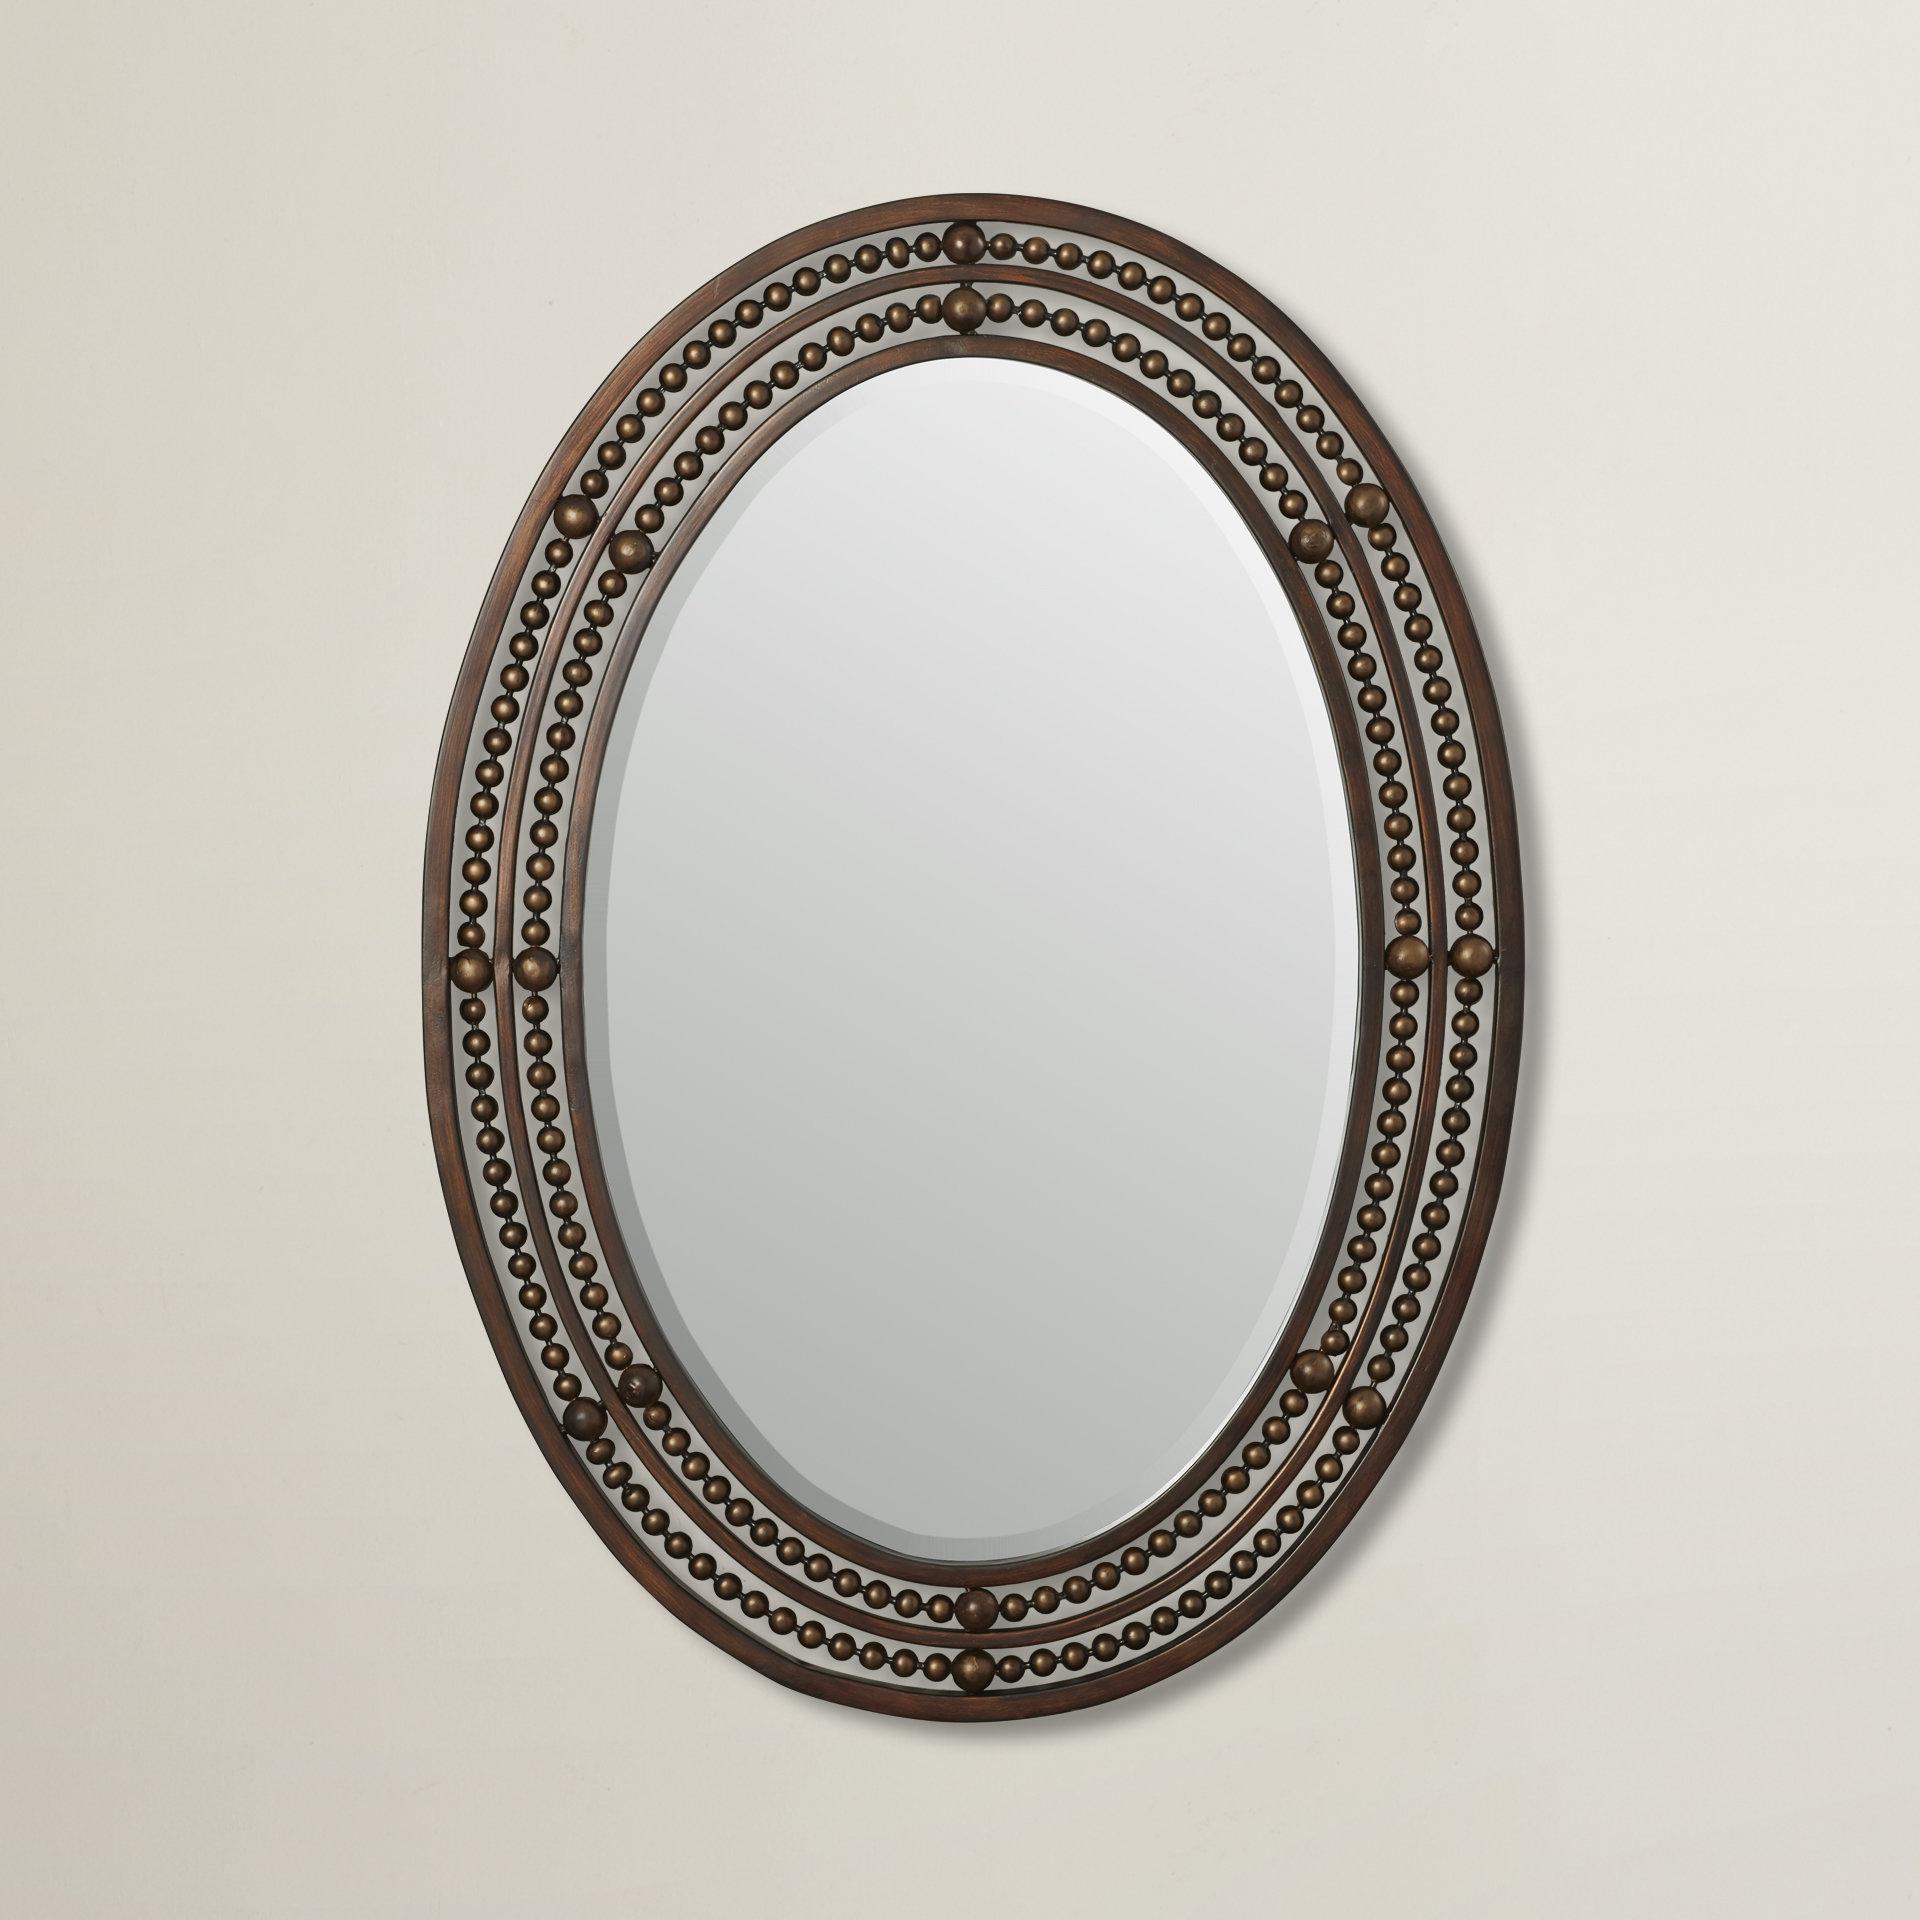 Leeper Oval Wall Mirror Regarding Burnes Oval Traditional Wall Mirrors (Image 9 of 20)